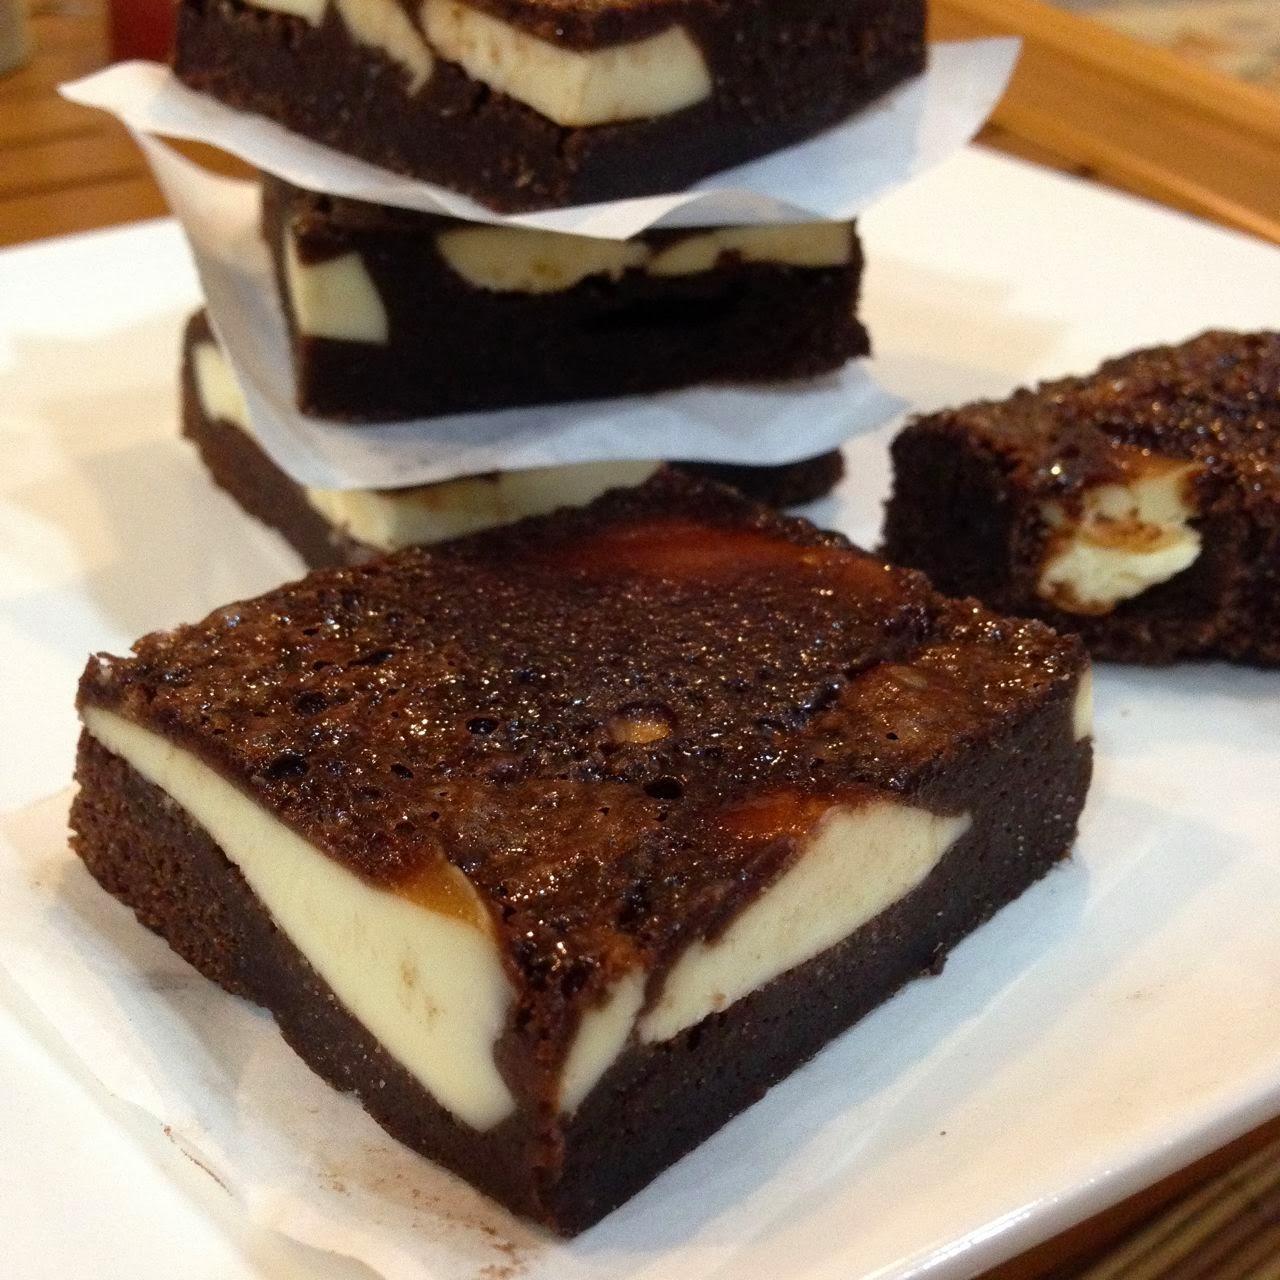 Baking Diary: Cream Cheese Brownies - Bake Along #58